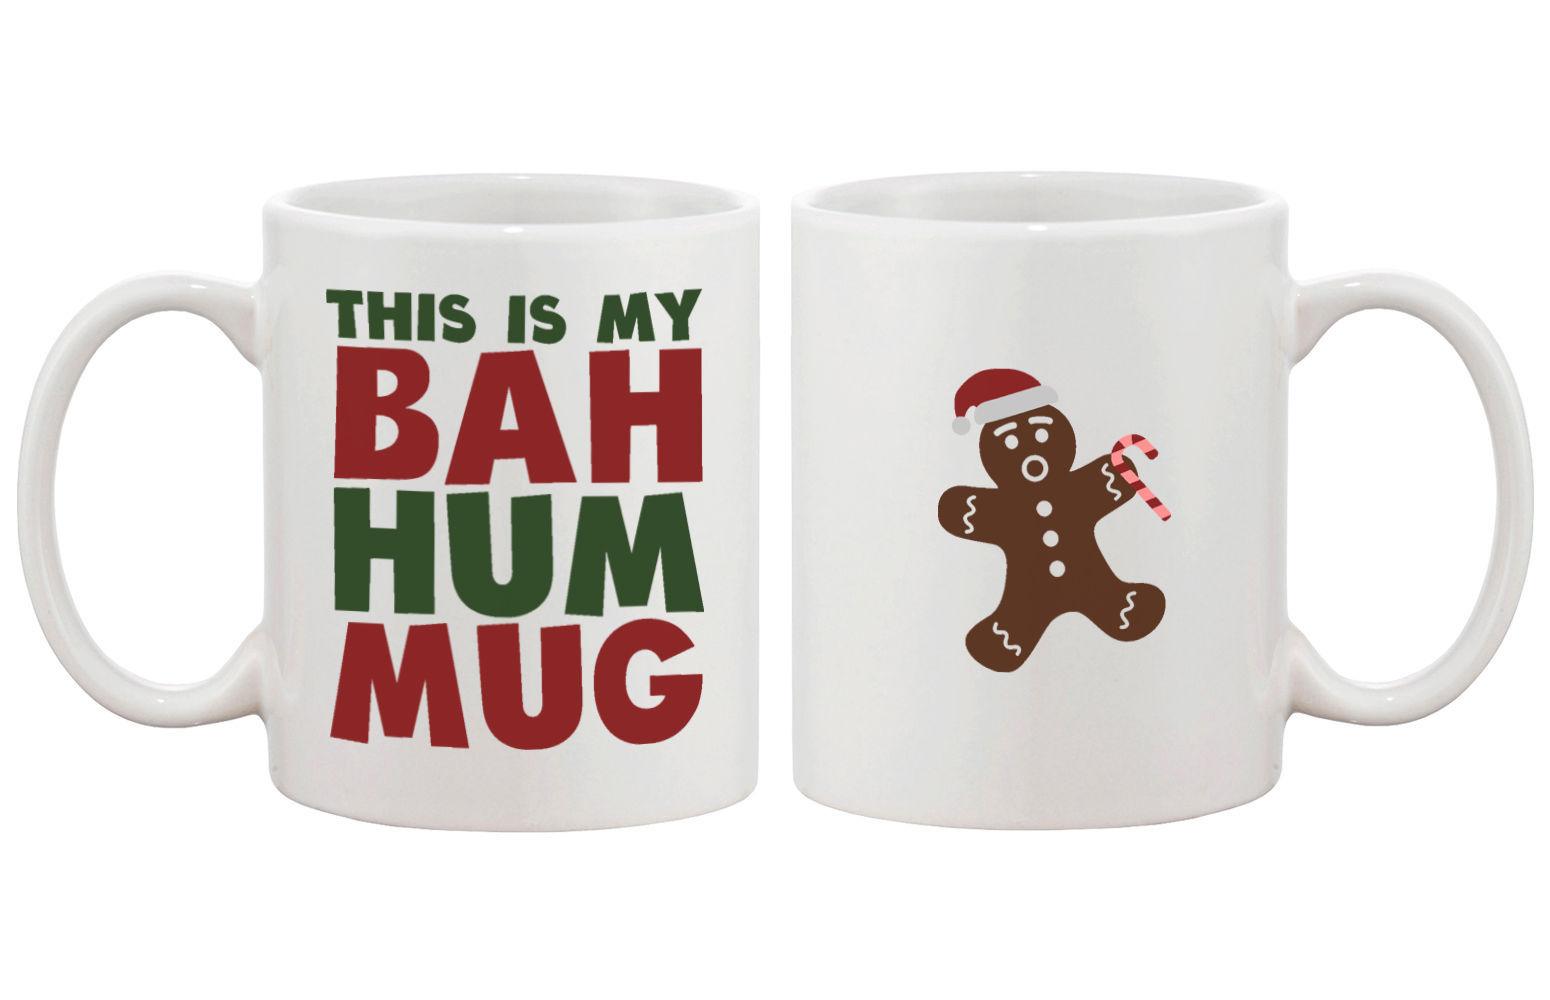 This Is My Bah Hum Mug Cute Christmas Gift Idea Funny Coffee Mugs for Holidays